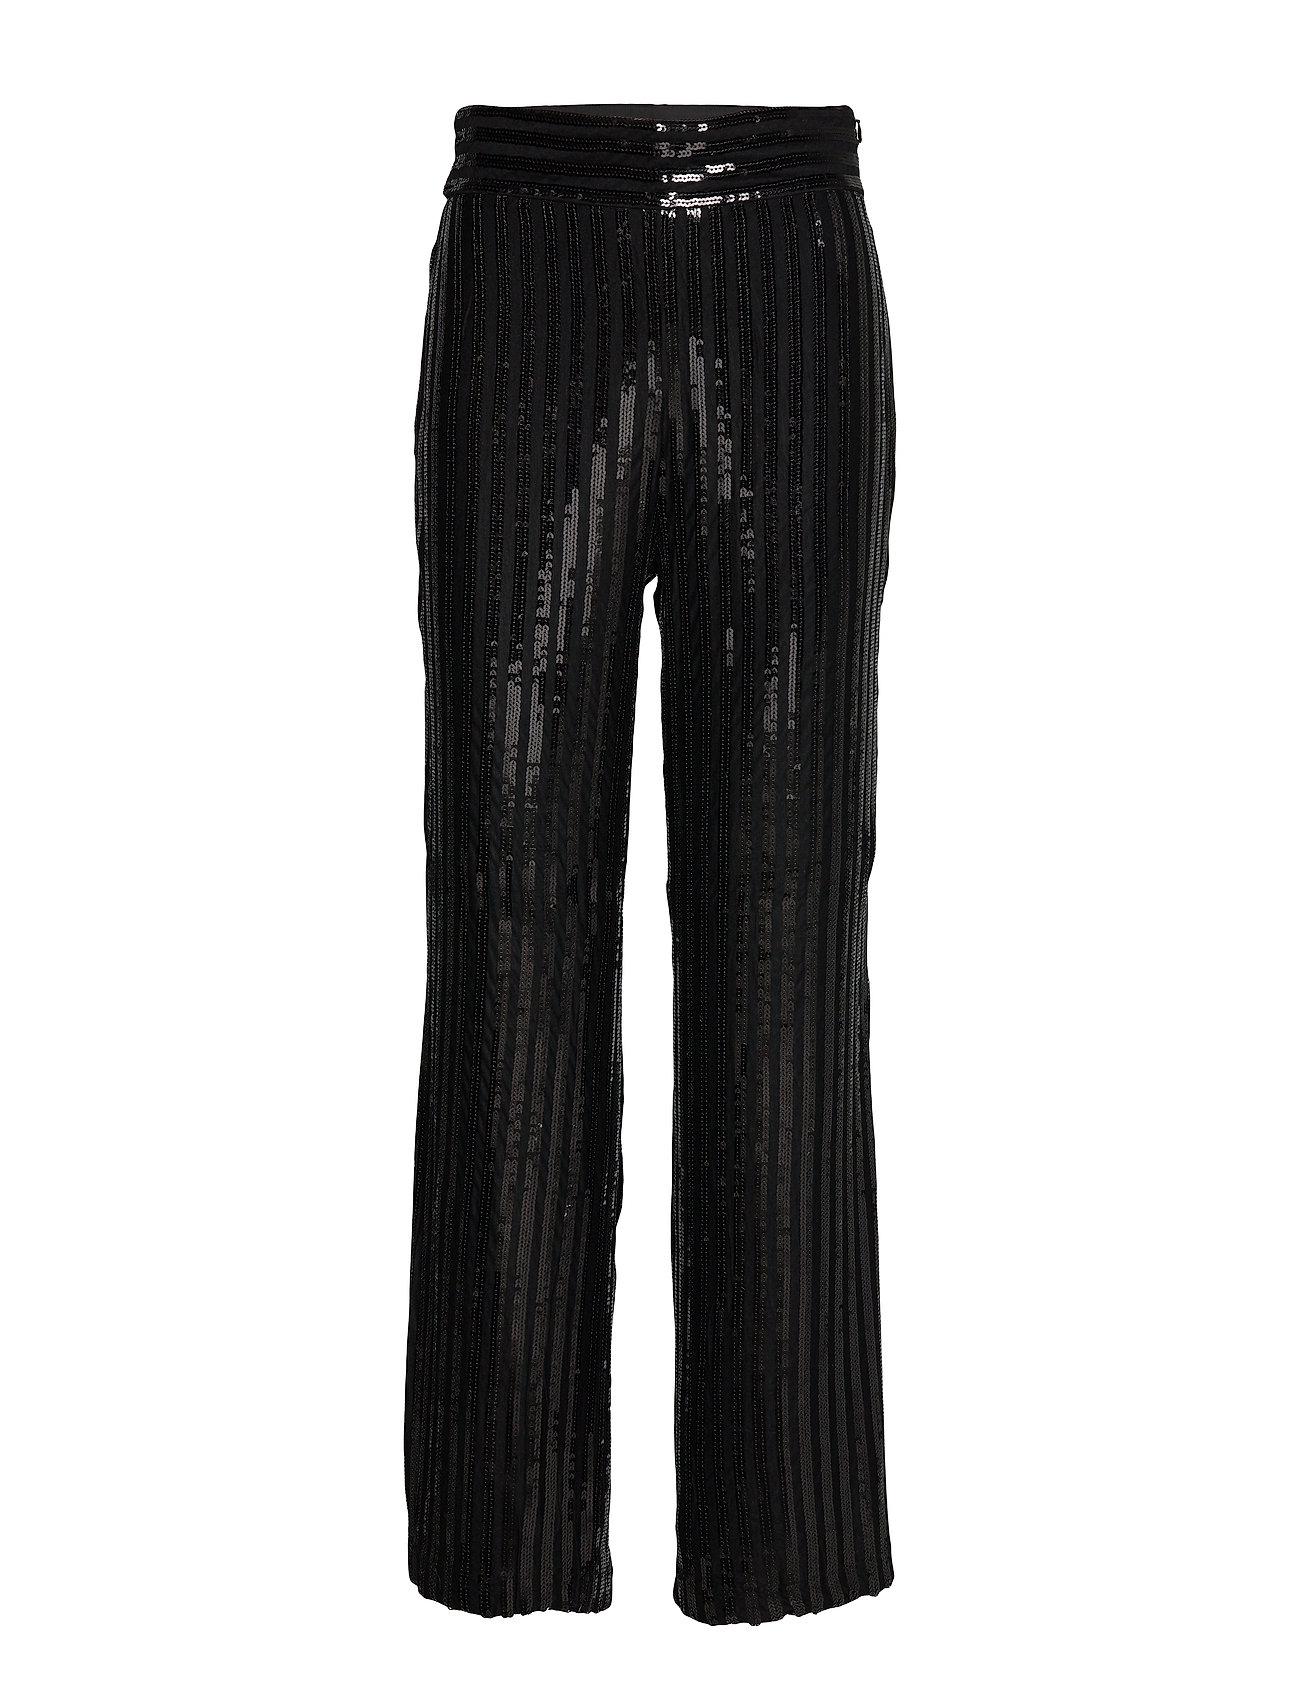 Twist & Tango Judi Sequin Trousers - BLACK